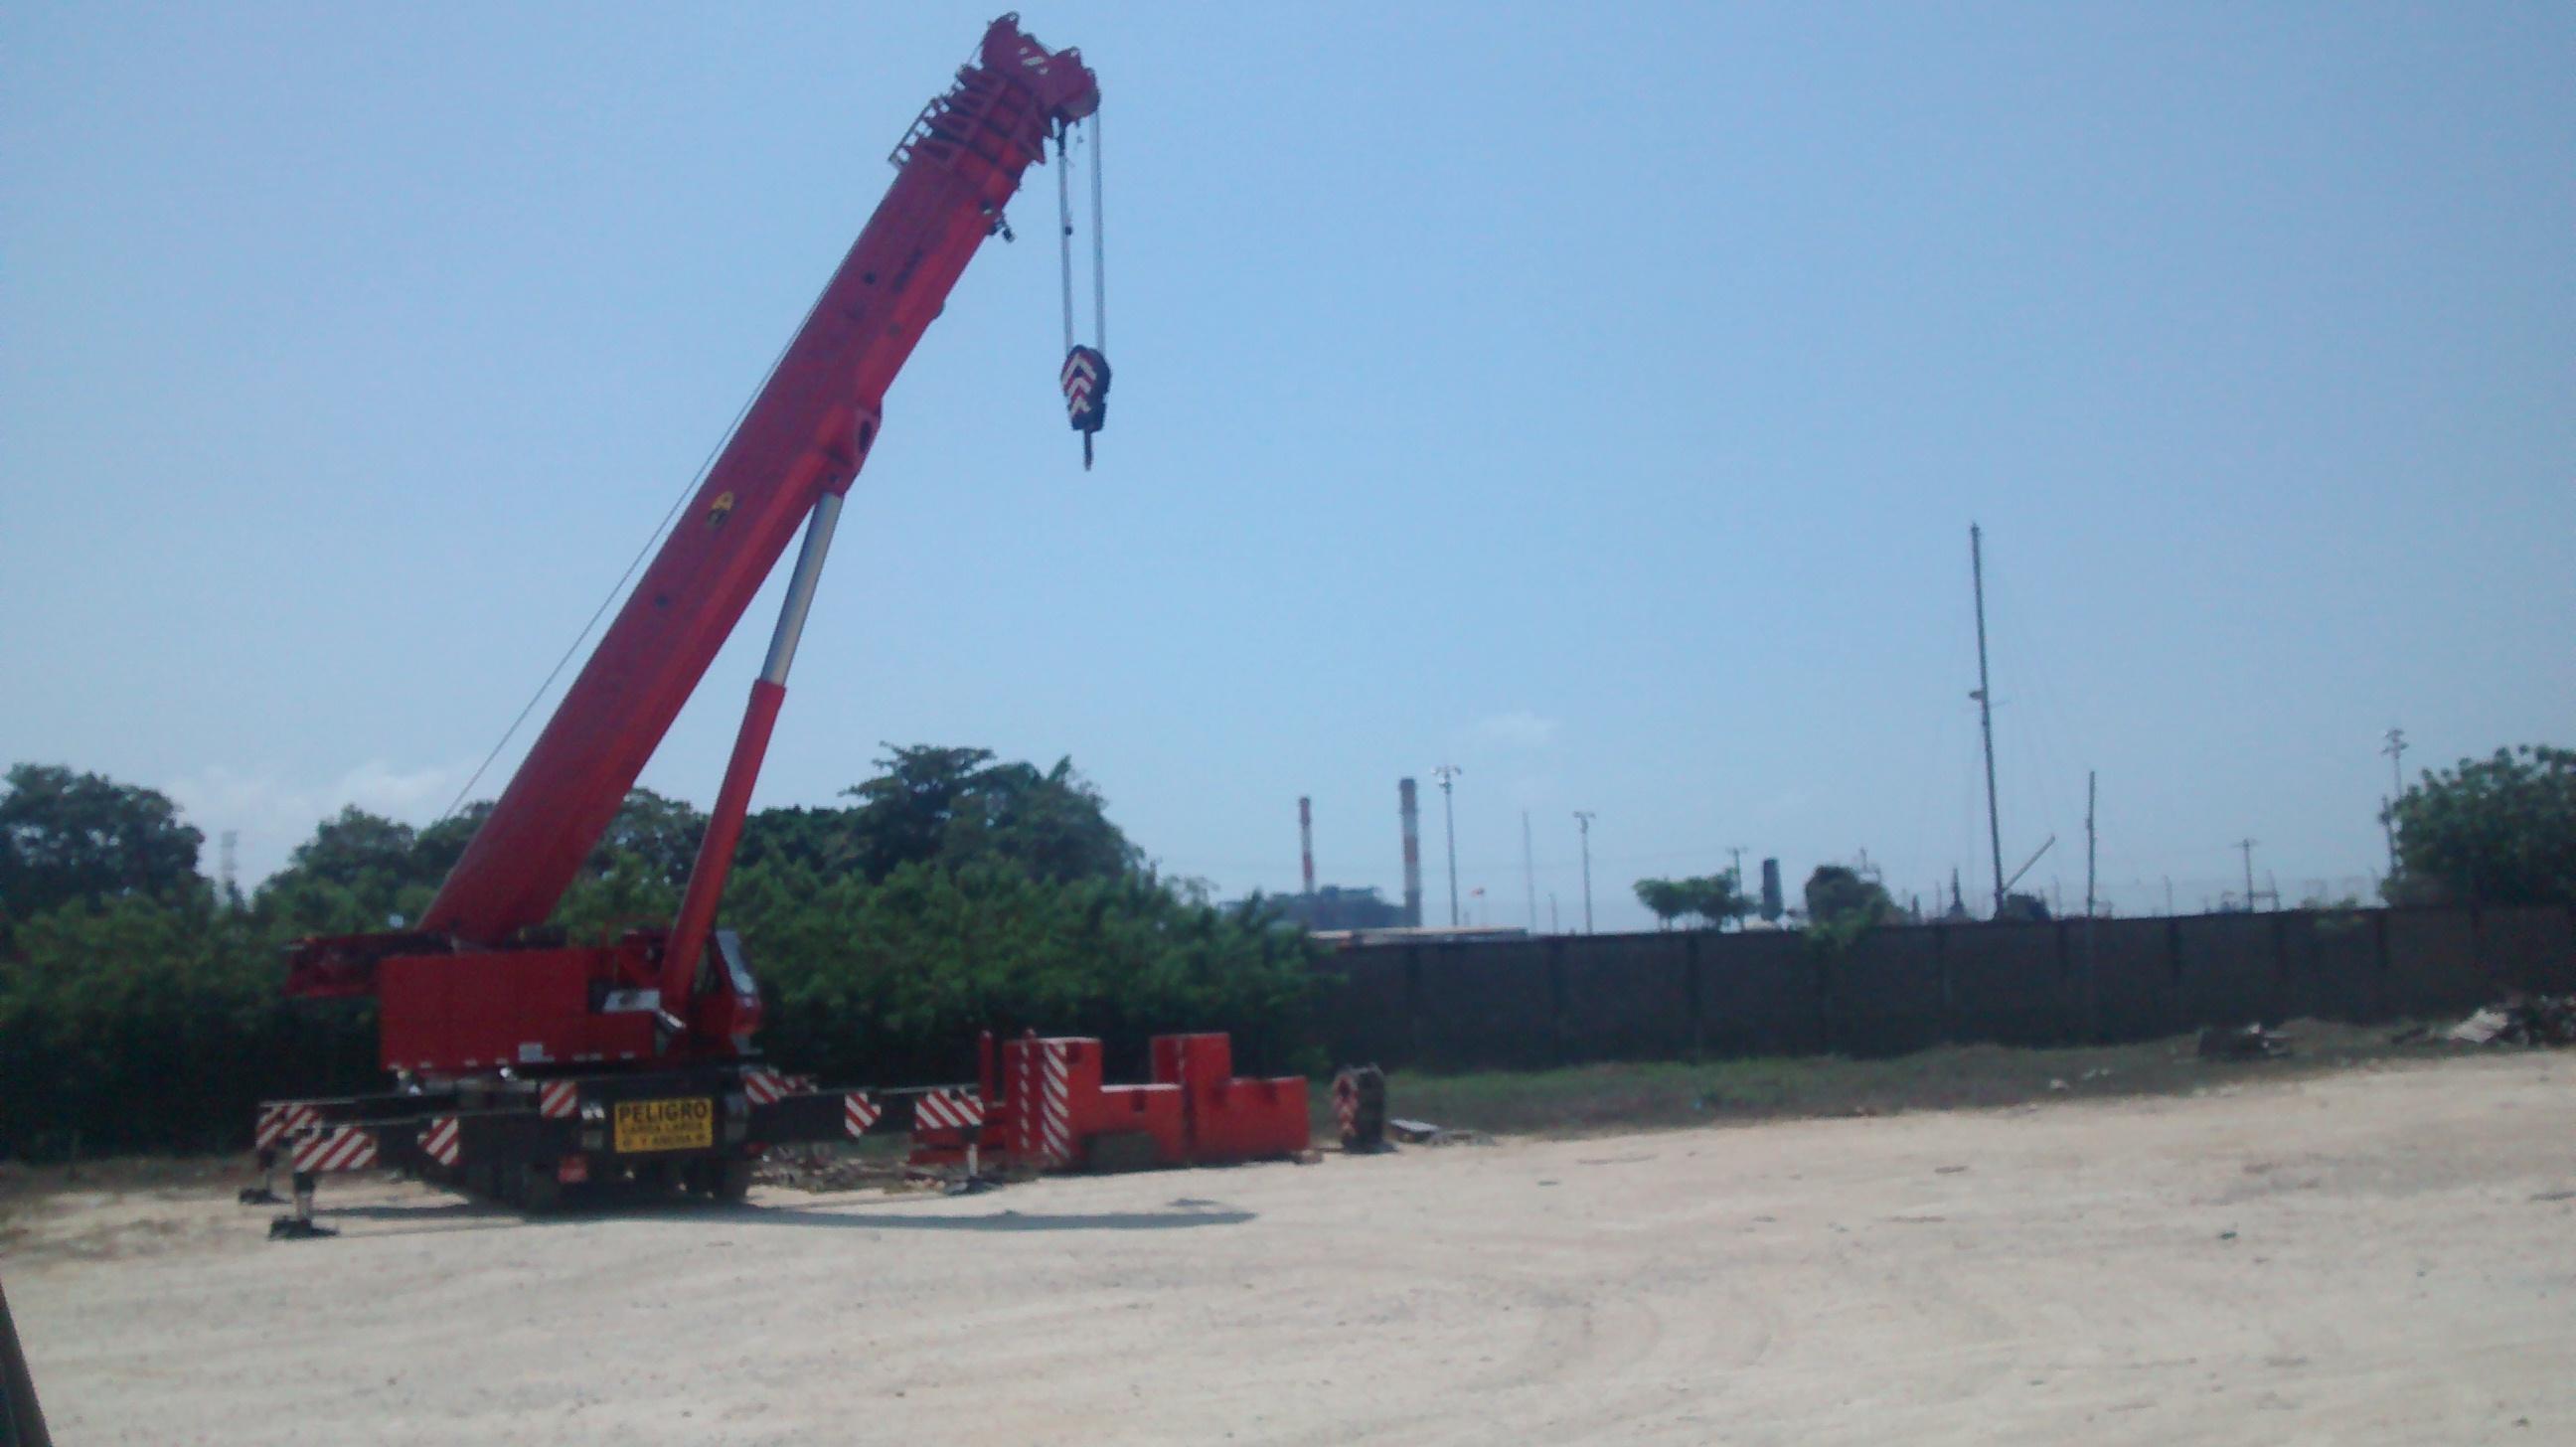 Telescopic Crane 200 Ton : Latest tecnology equipment